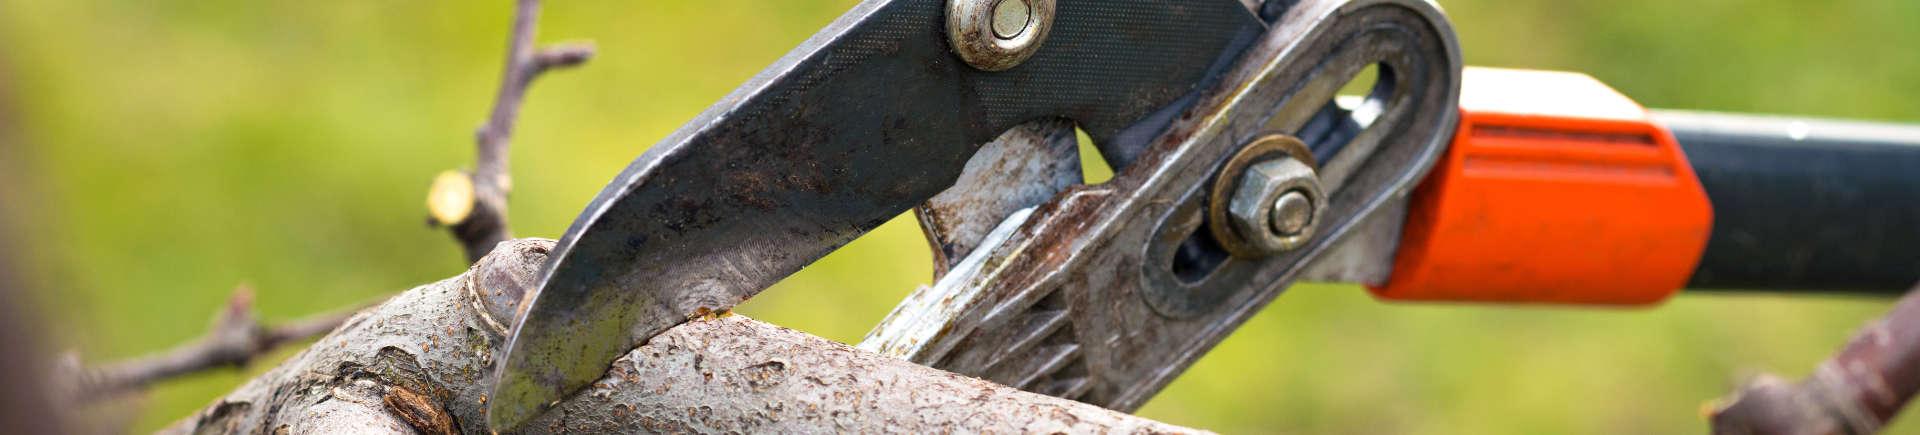 Alpharetta GA professional cutting and shaping shrubs